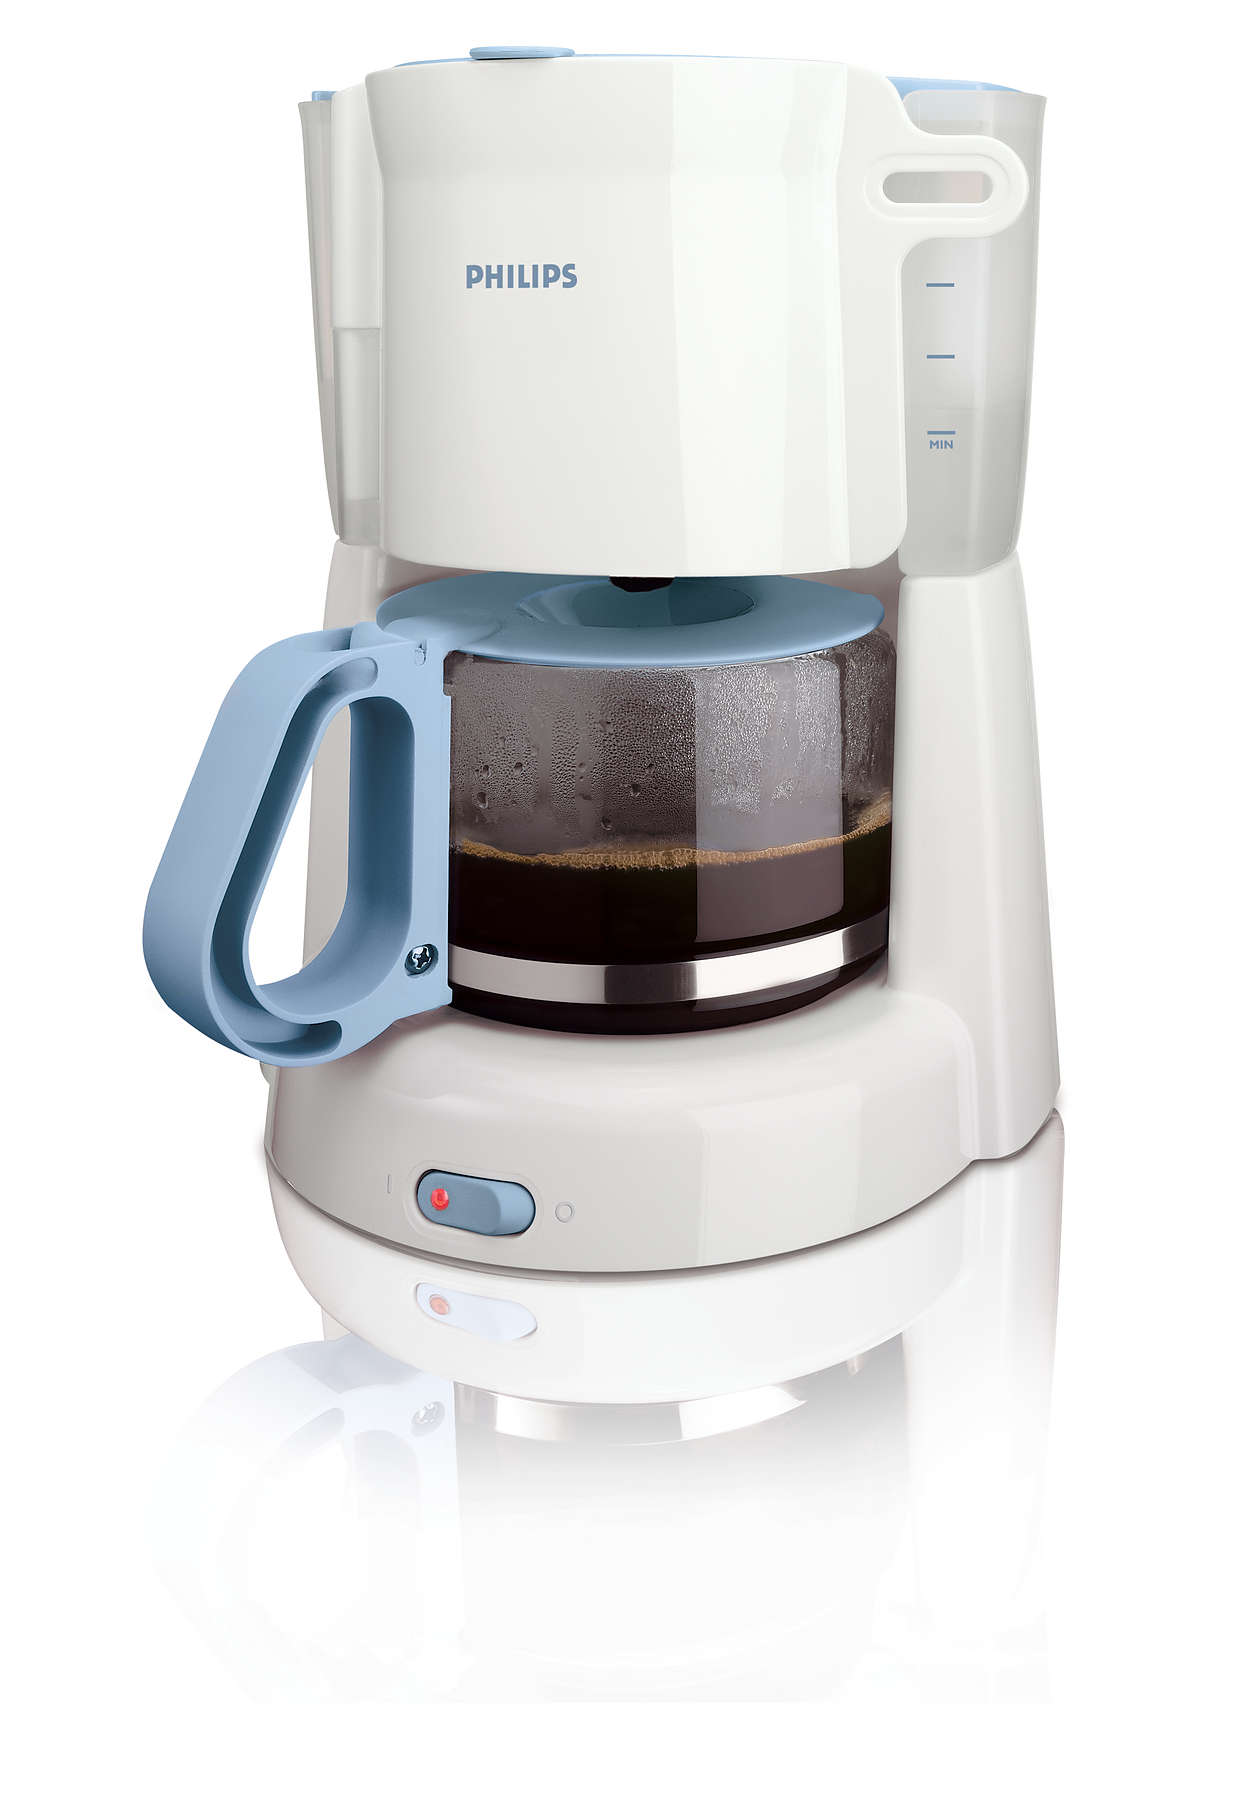 Delicioso café, fácil de preparar